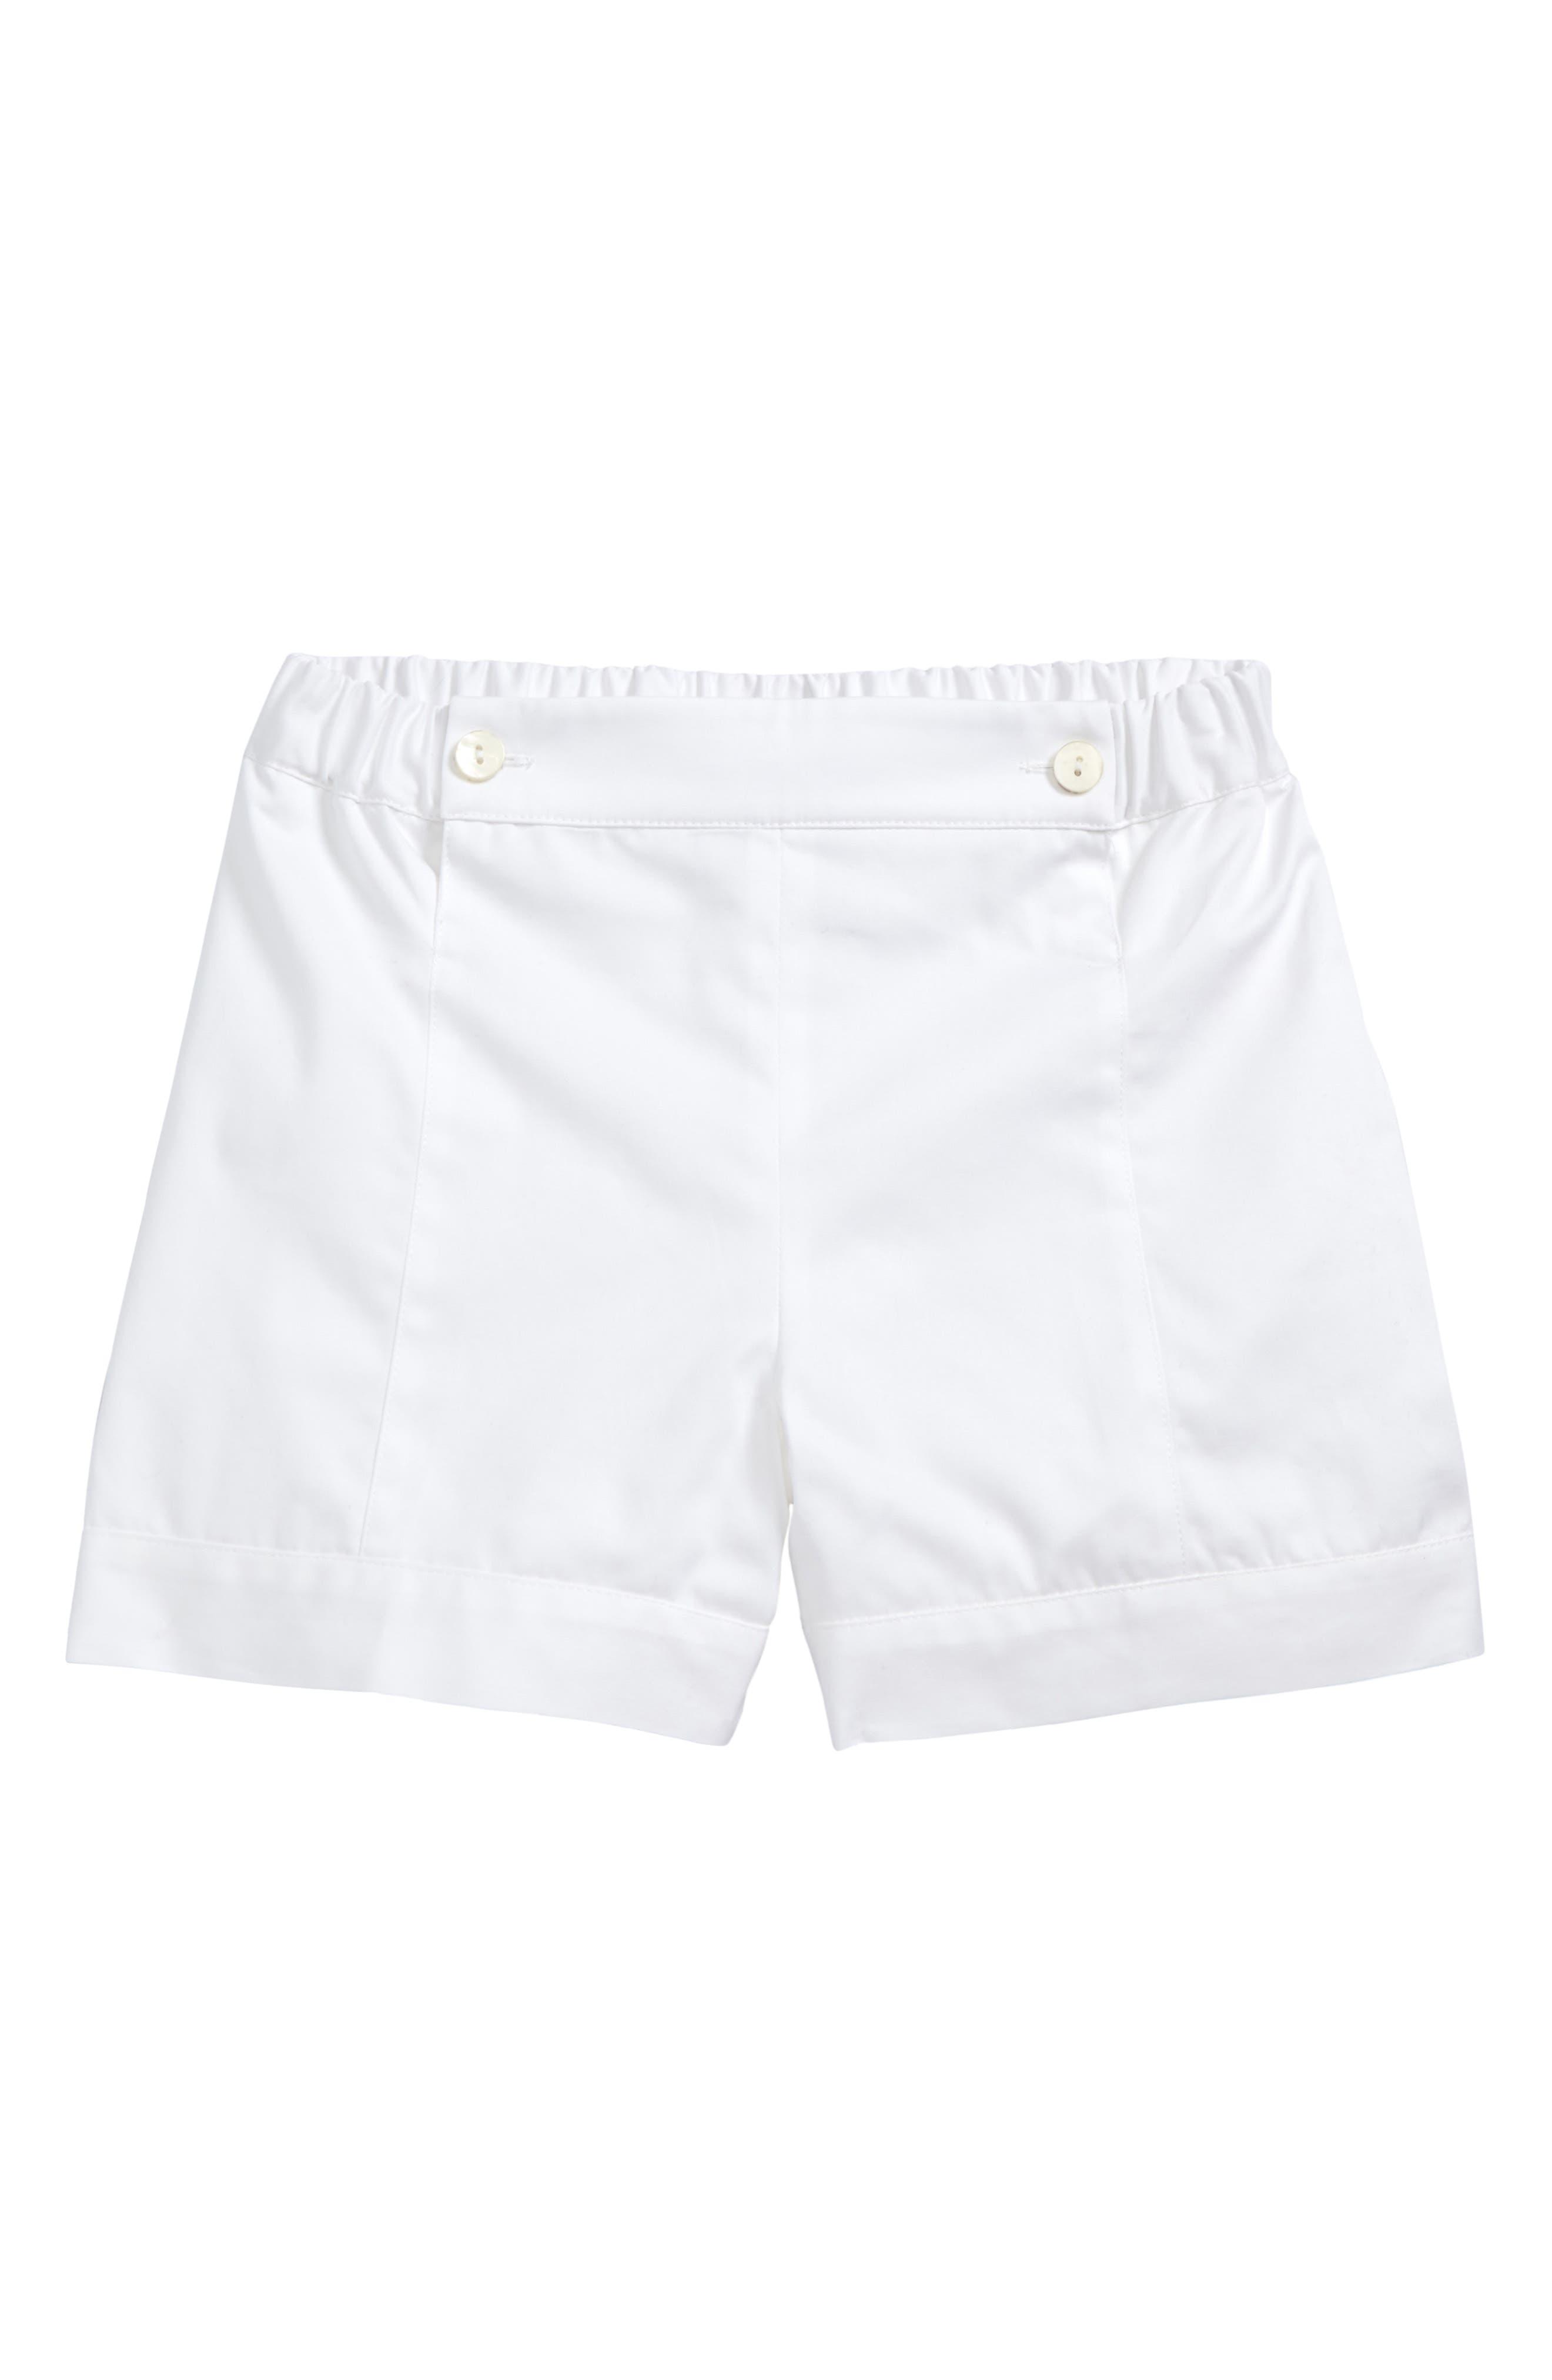 Sailor Shorts,                             Main thumbnail 1, color,                             White